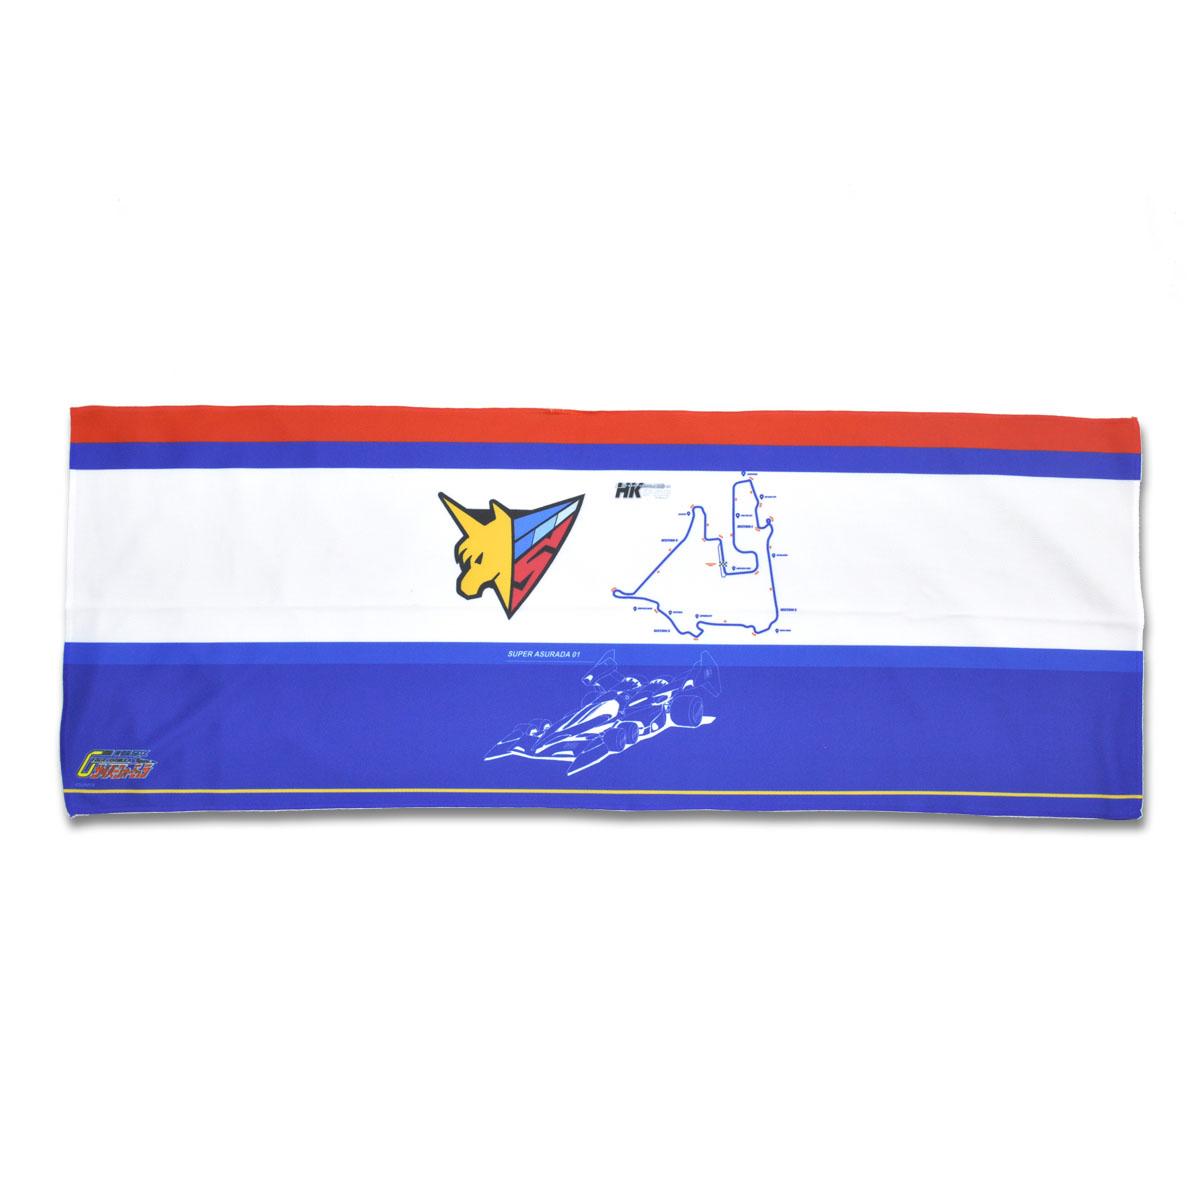 Cold Towel (HK Limited)  SUGO ASURADA